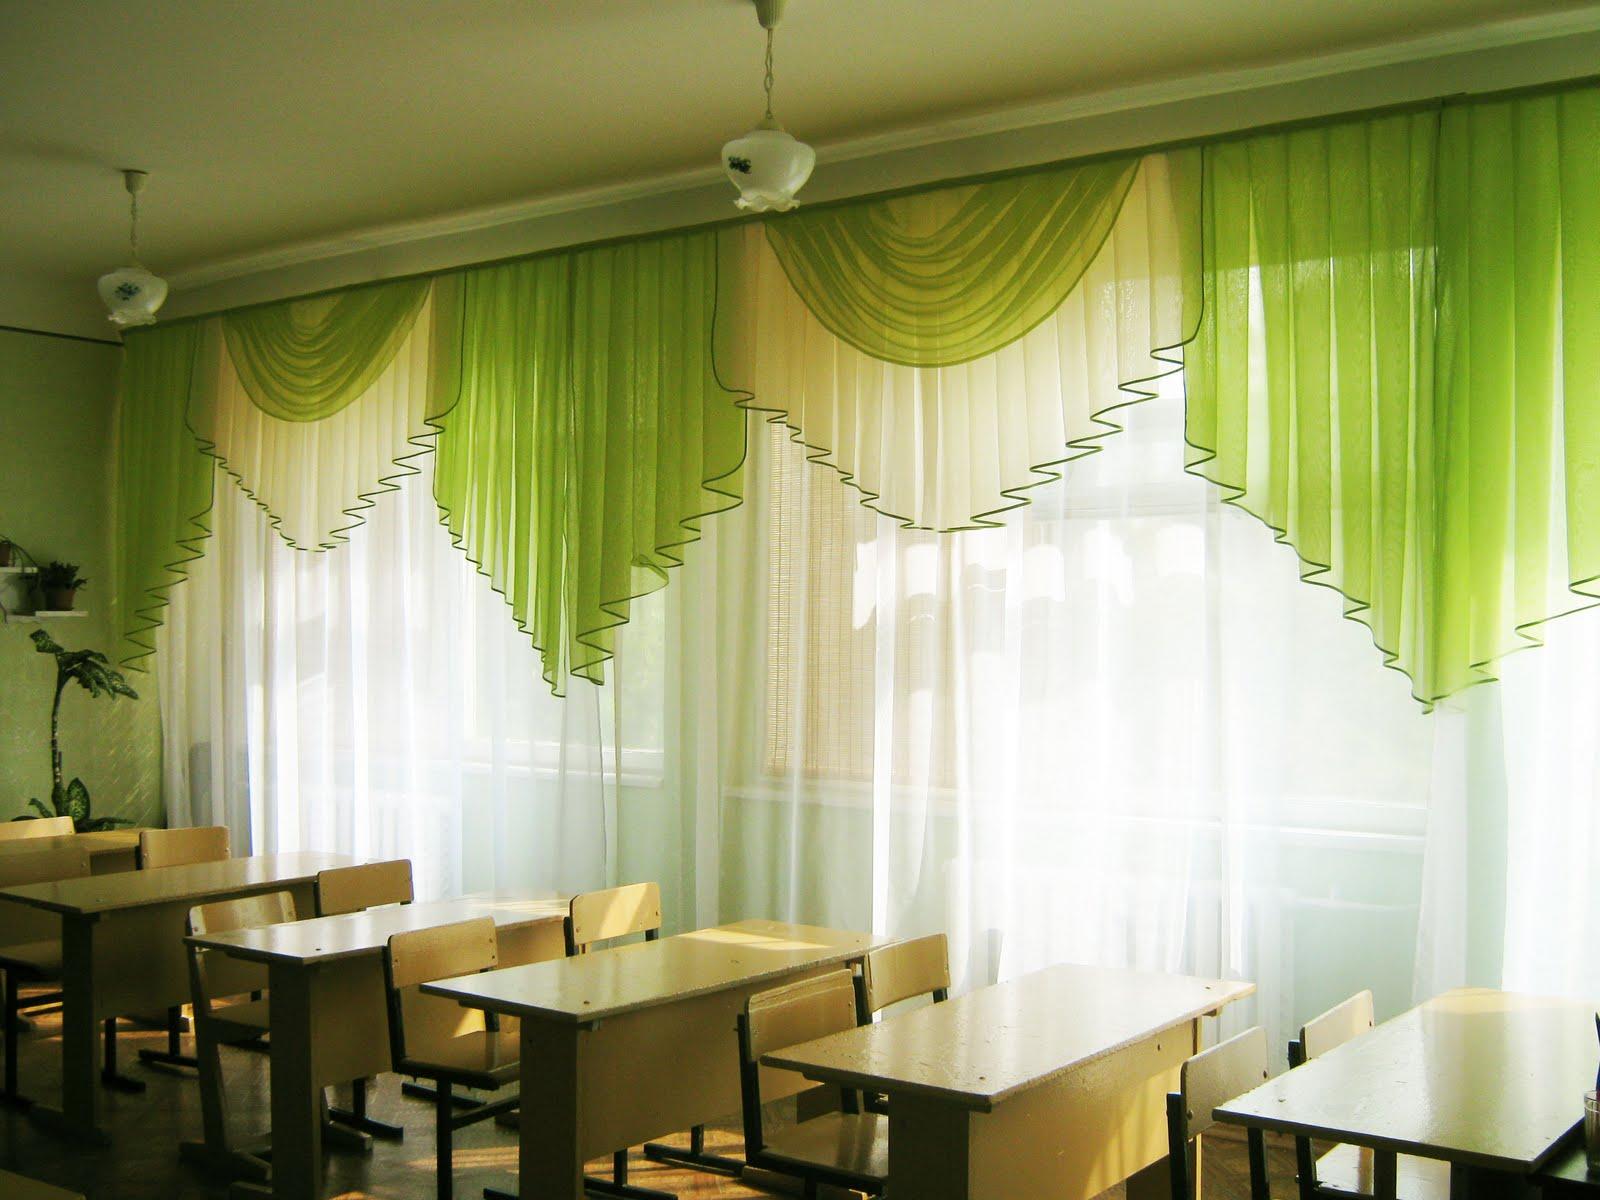 Дизайн штор для школы